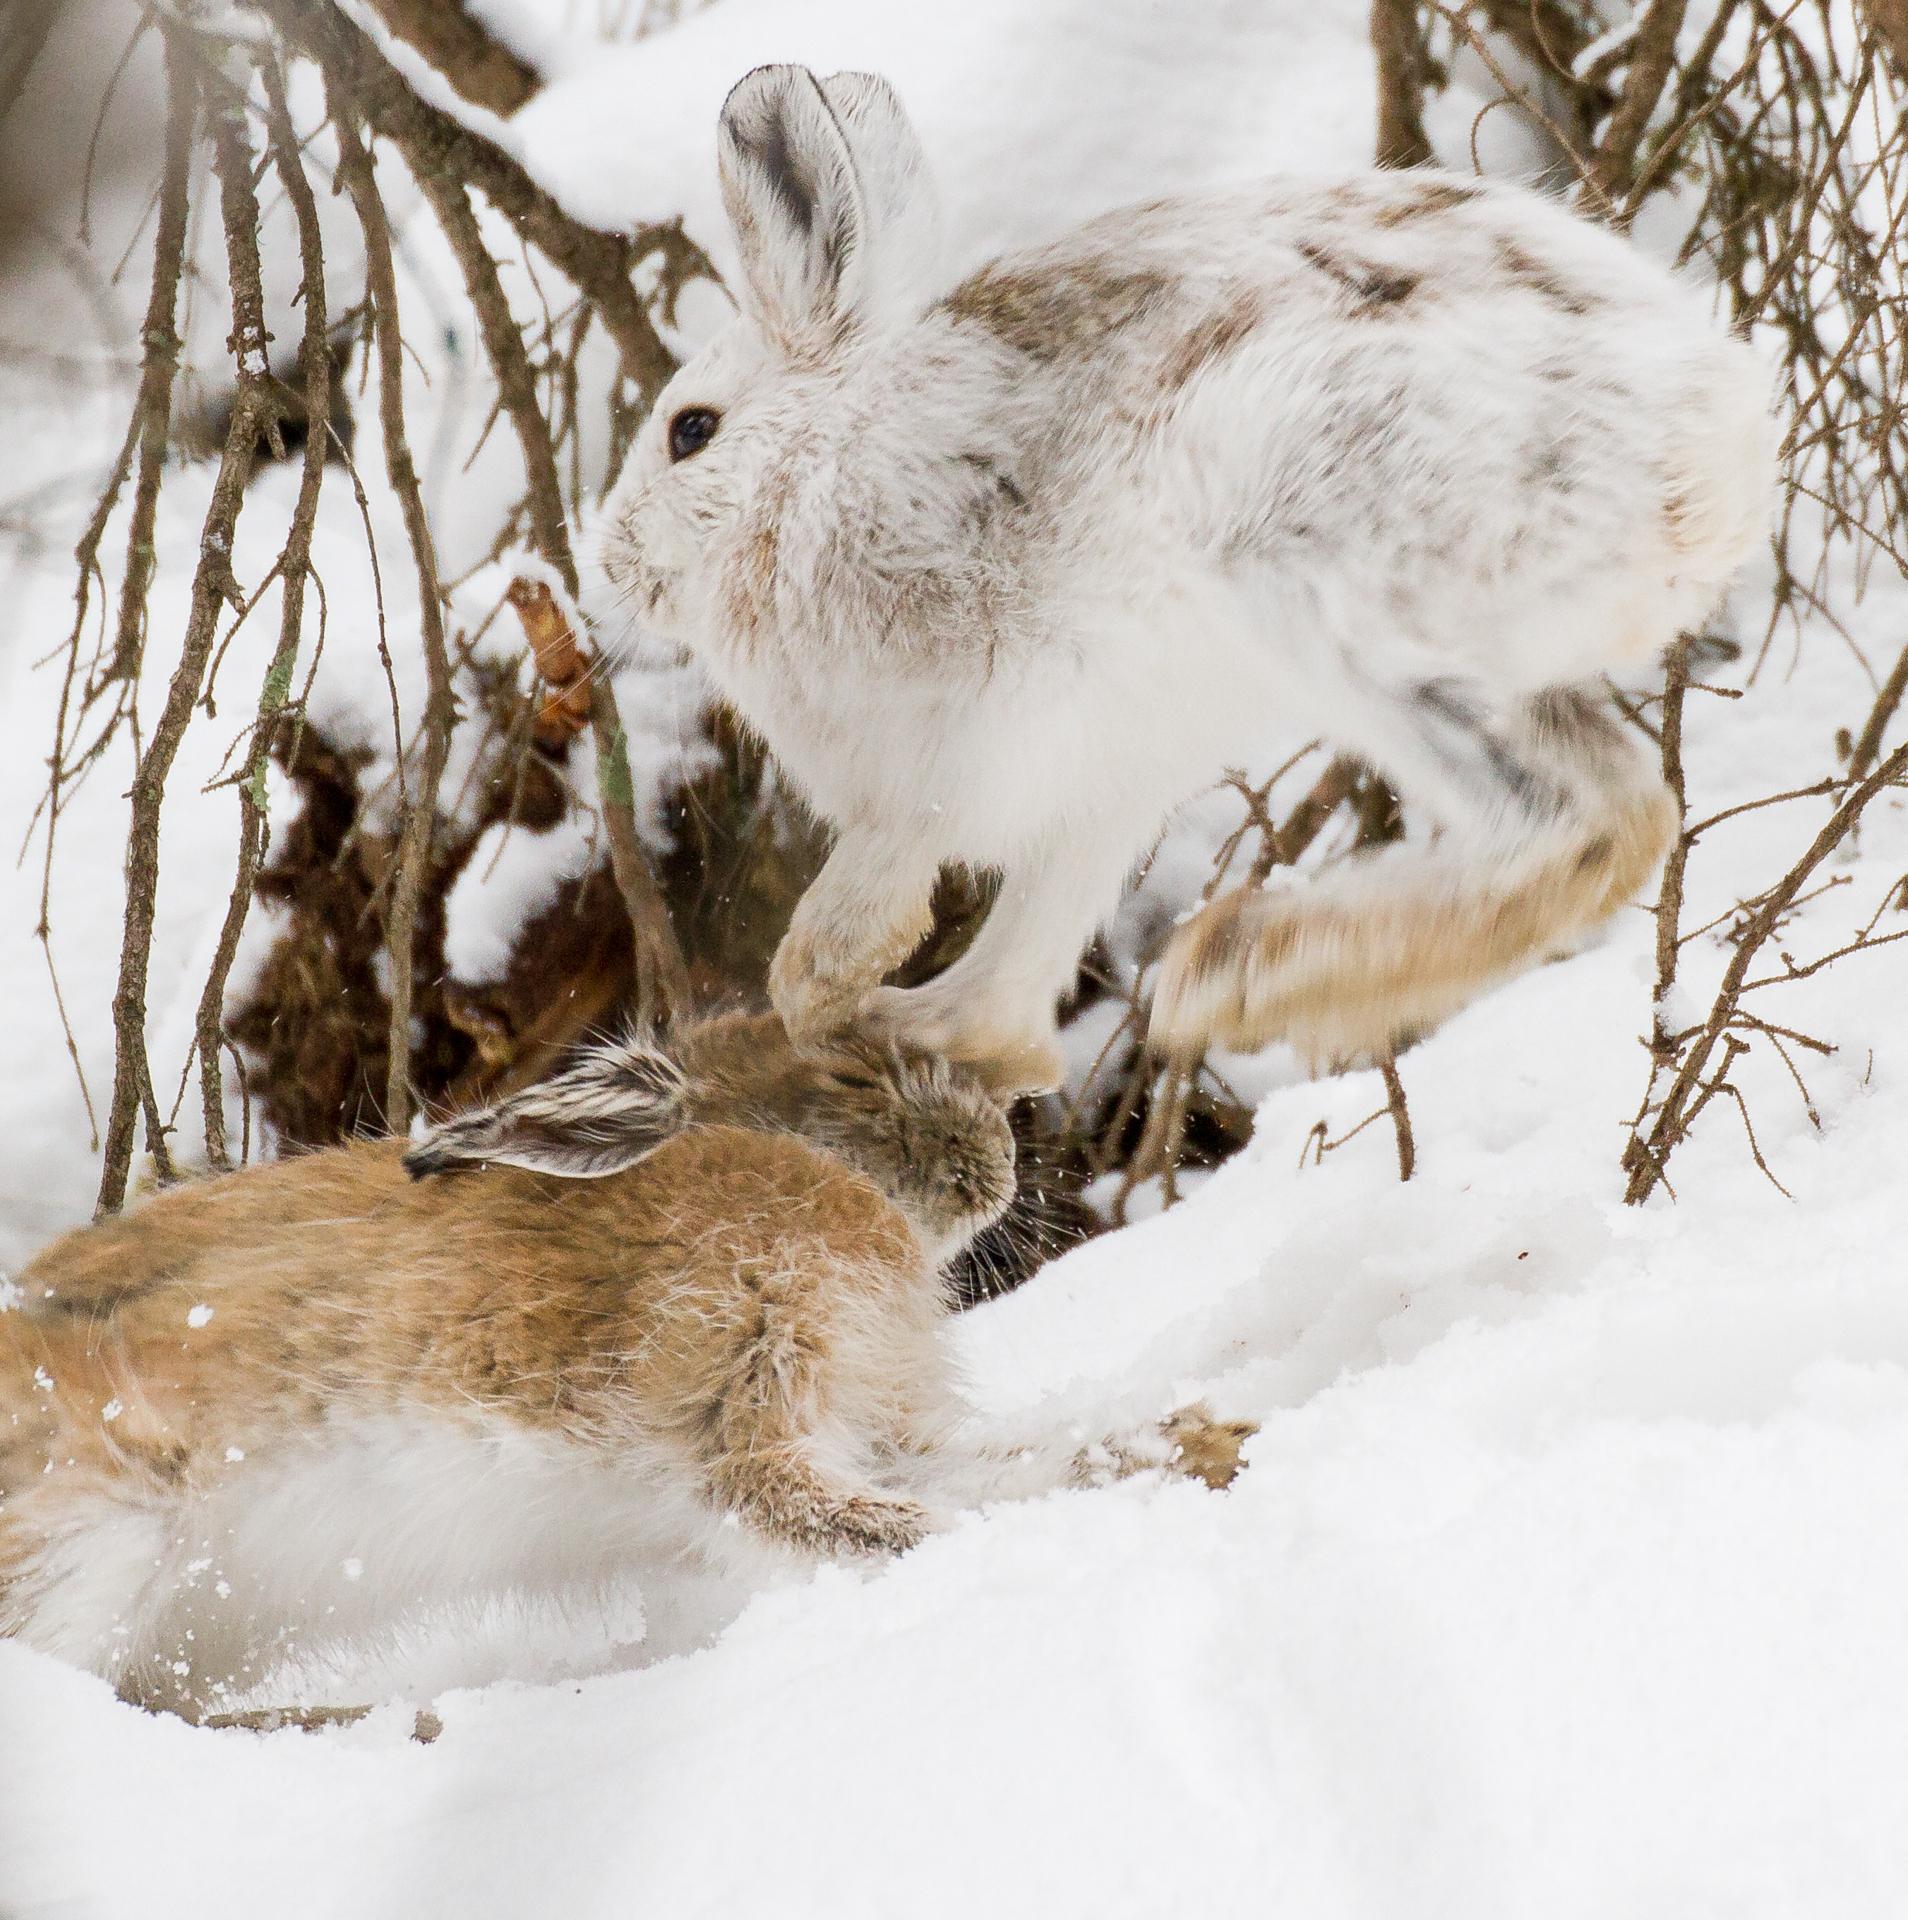 Snowshoe Hare pair leaping Warren Nelson Memorial Bog Sax-Zim Bog MN IMG_0725